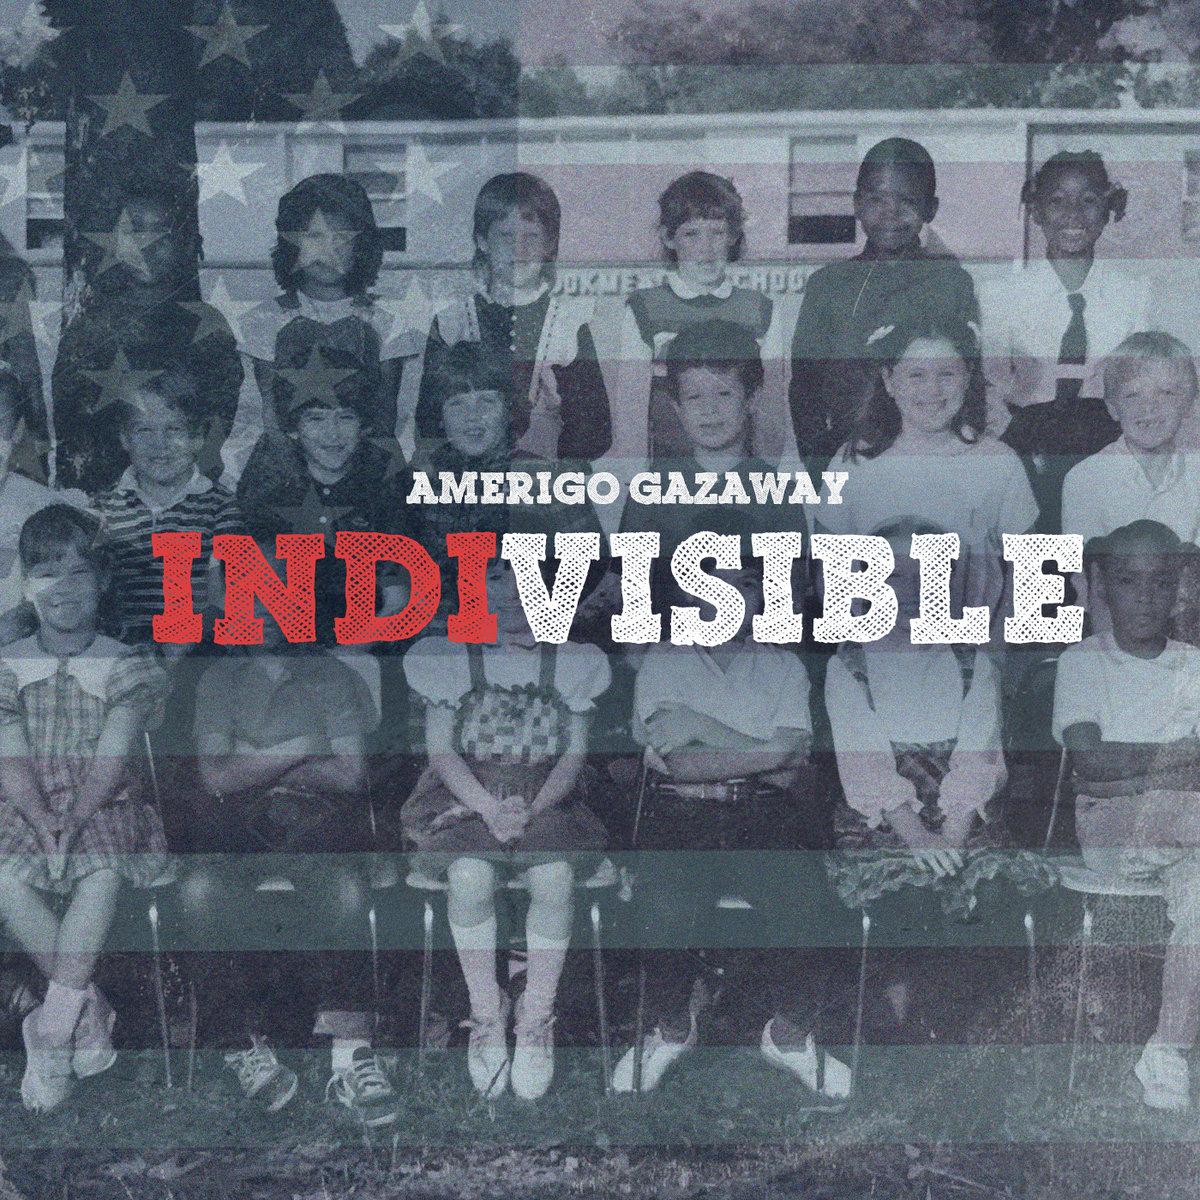 Indivisible von Amerigo Gazaway | Song of the Day